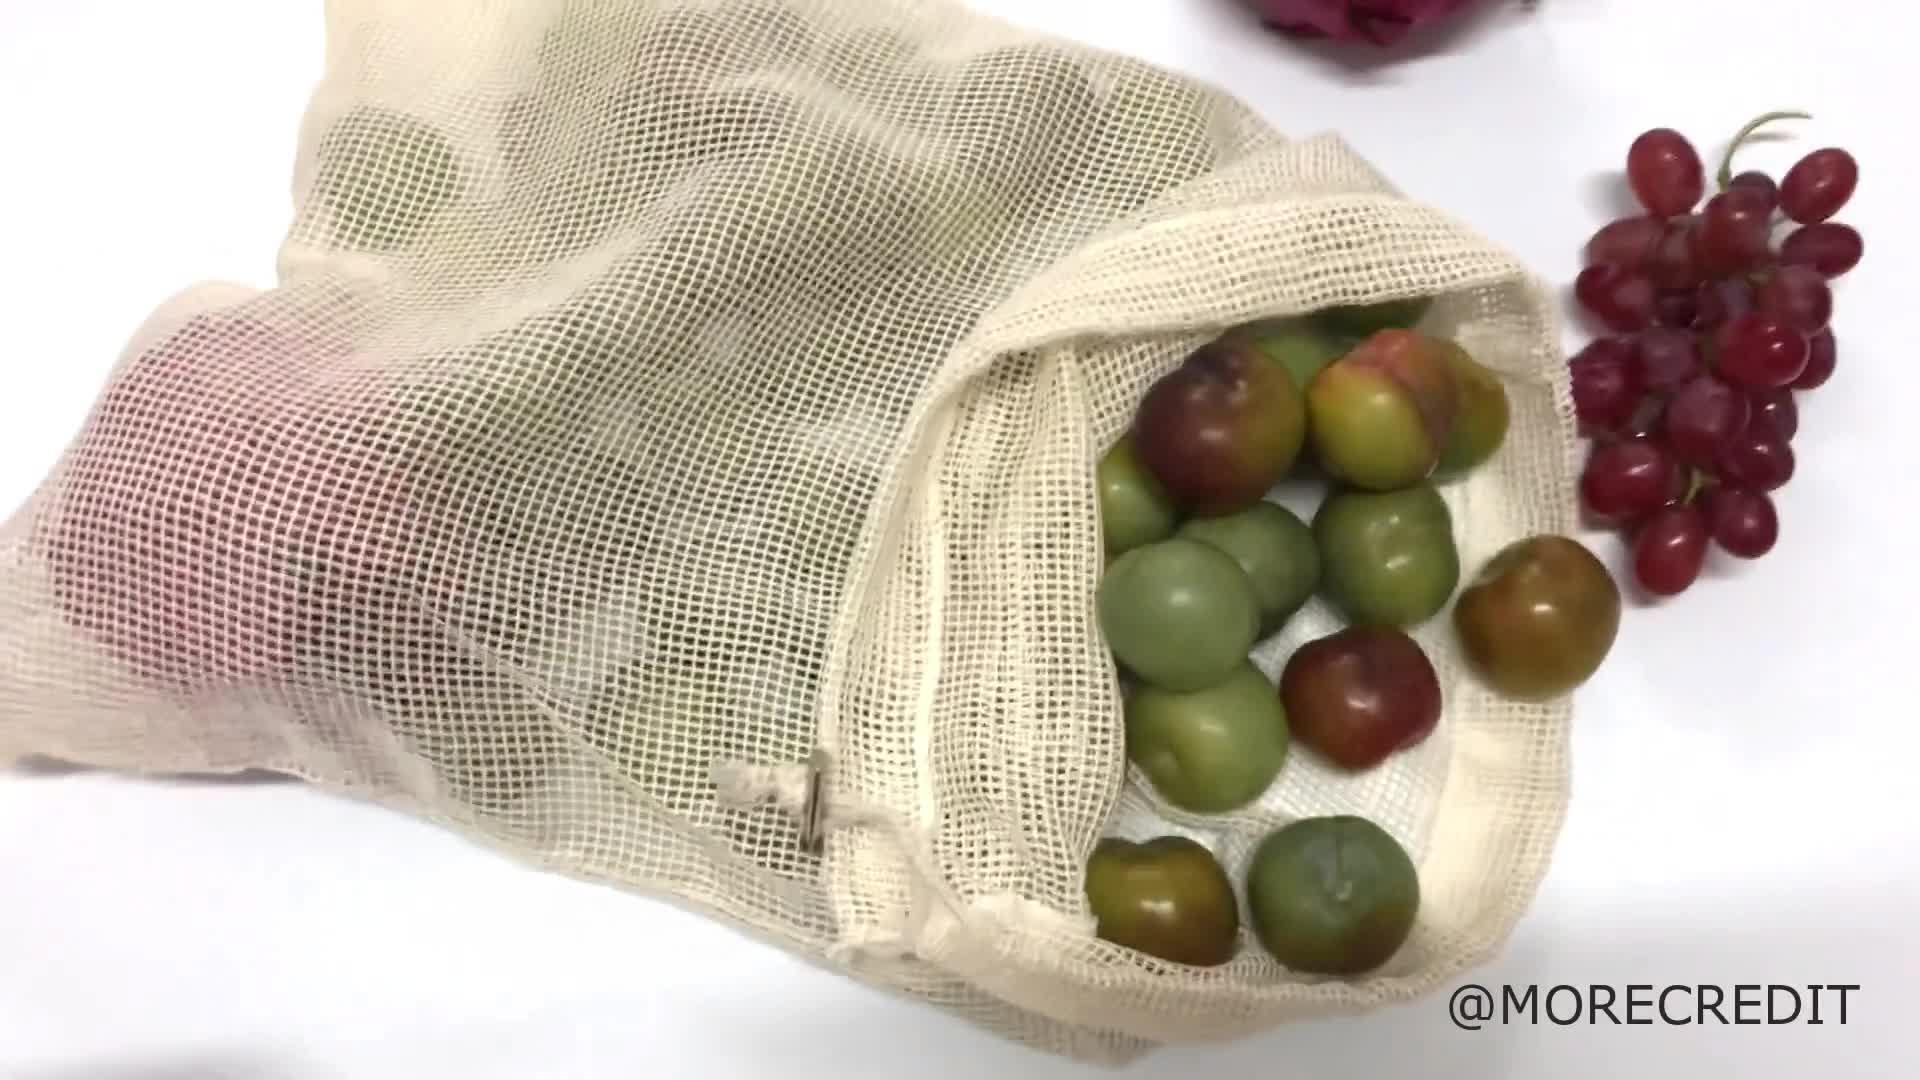 Morecredit Multipurpose Reusable 5OZ Natural Drawstring Organic Cotton Bag For Fruits Vegetables